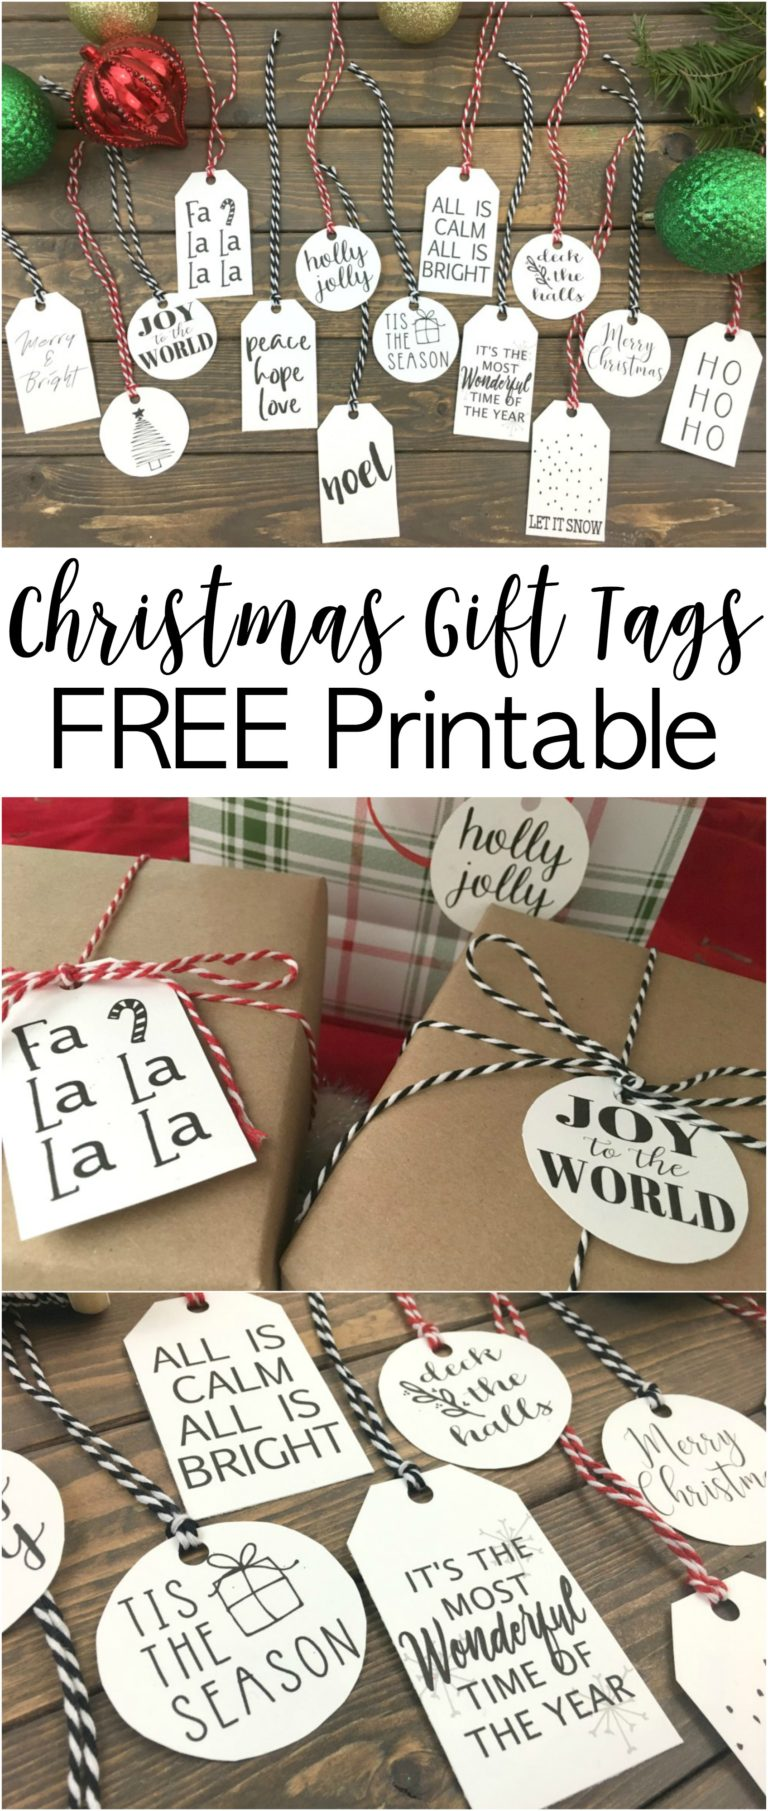 Simple Christmas Gift Tags - FREE Printable - Dream Design DIY